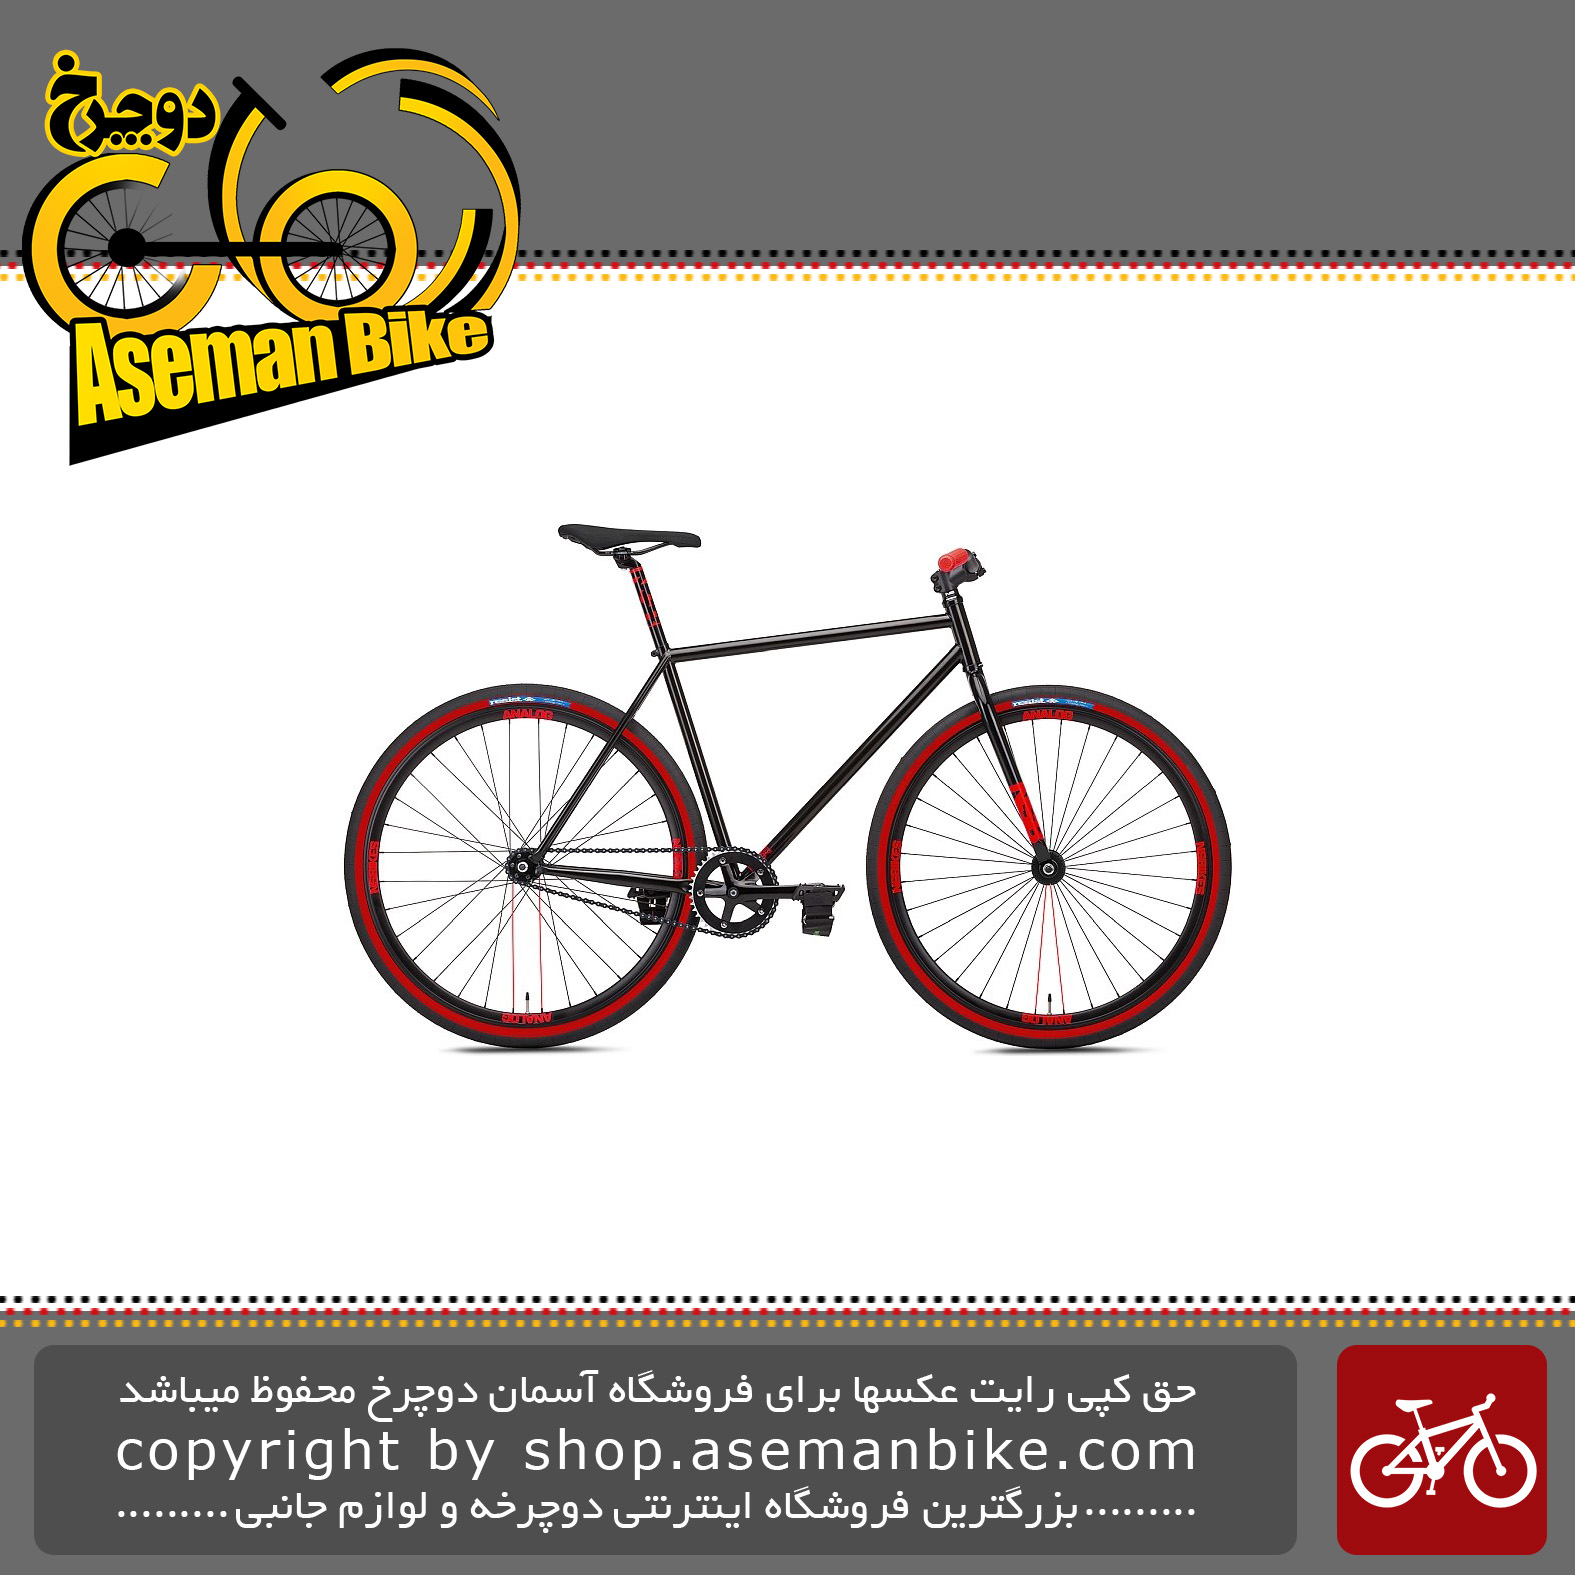 دوچرخه فیتنس ان اس آنالوگ 28 اینچ تک سرعته کوموتر NS Bikes ANALOG 28 Inch Singlespeed Commuter